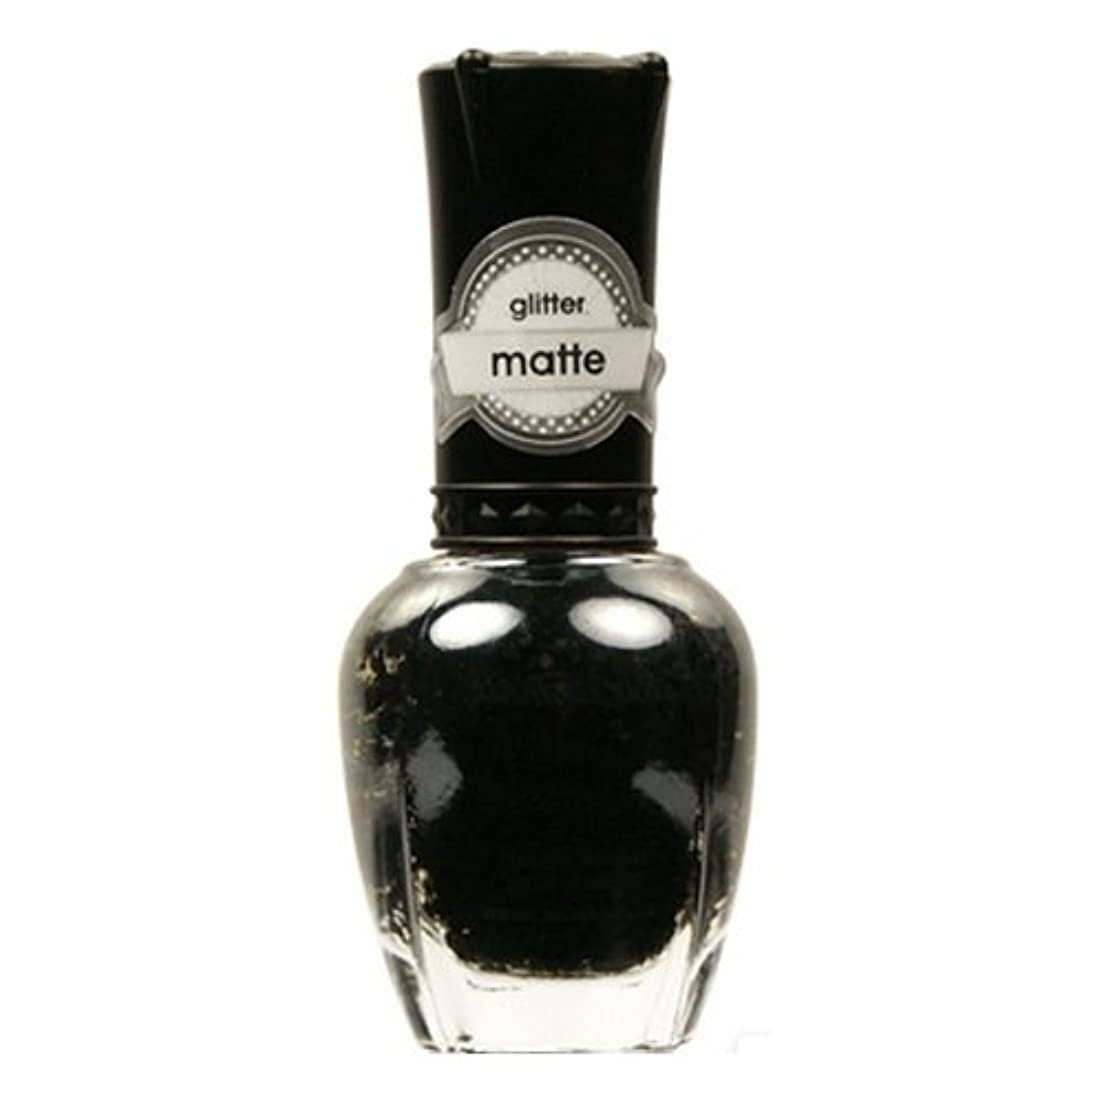 KLEANCOLOR Glitter Matte Nail Lacquer - Beyond Time & Space (並行輸入品)